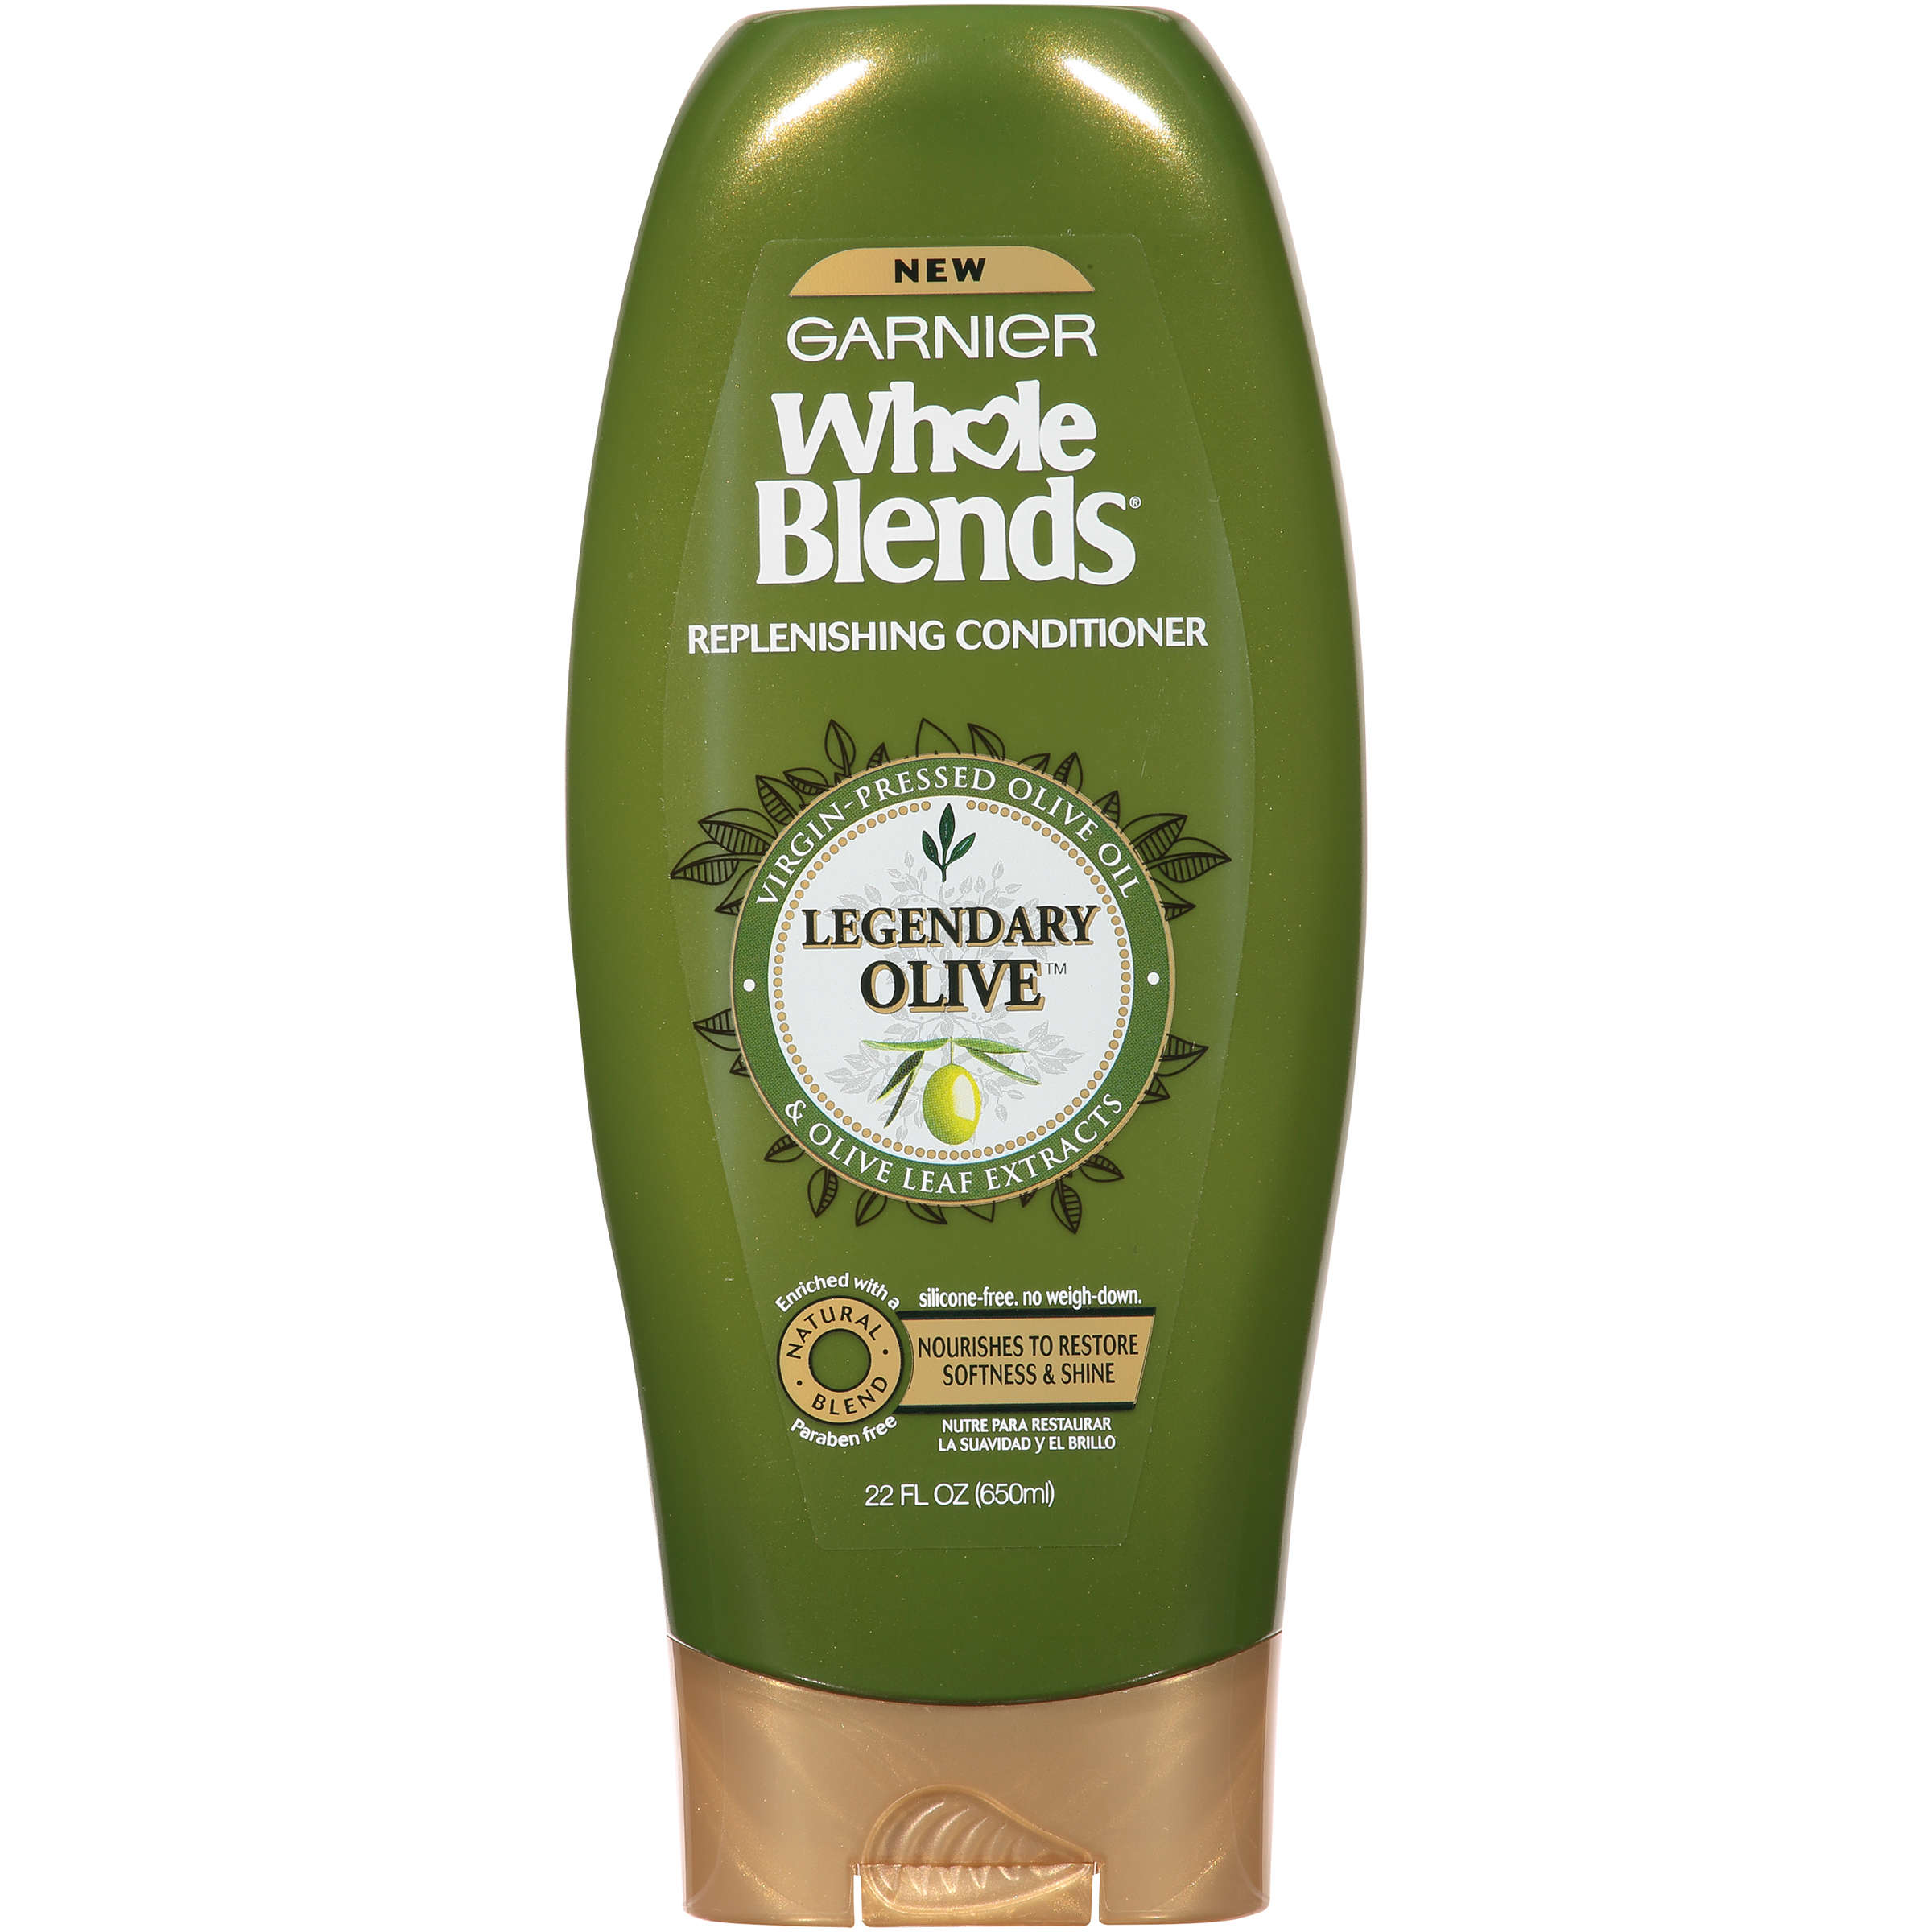 Garnier Whole Blends Replenishing Conditioner Legendary Olive 22 FL OZ